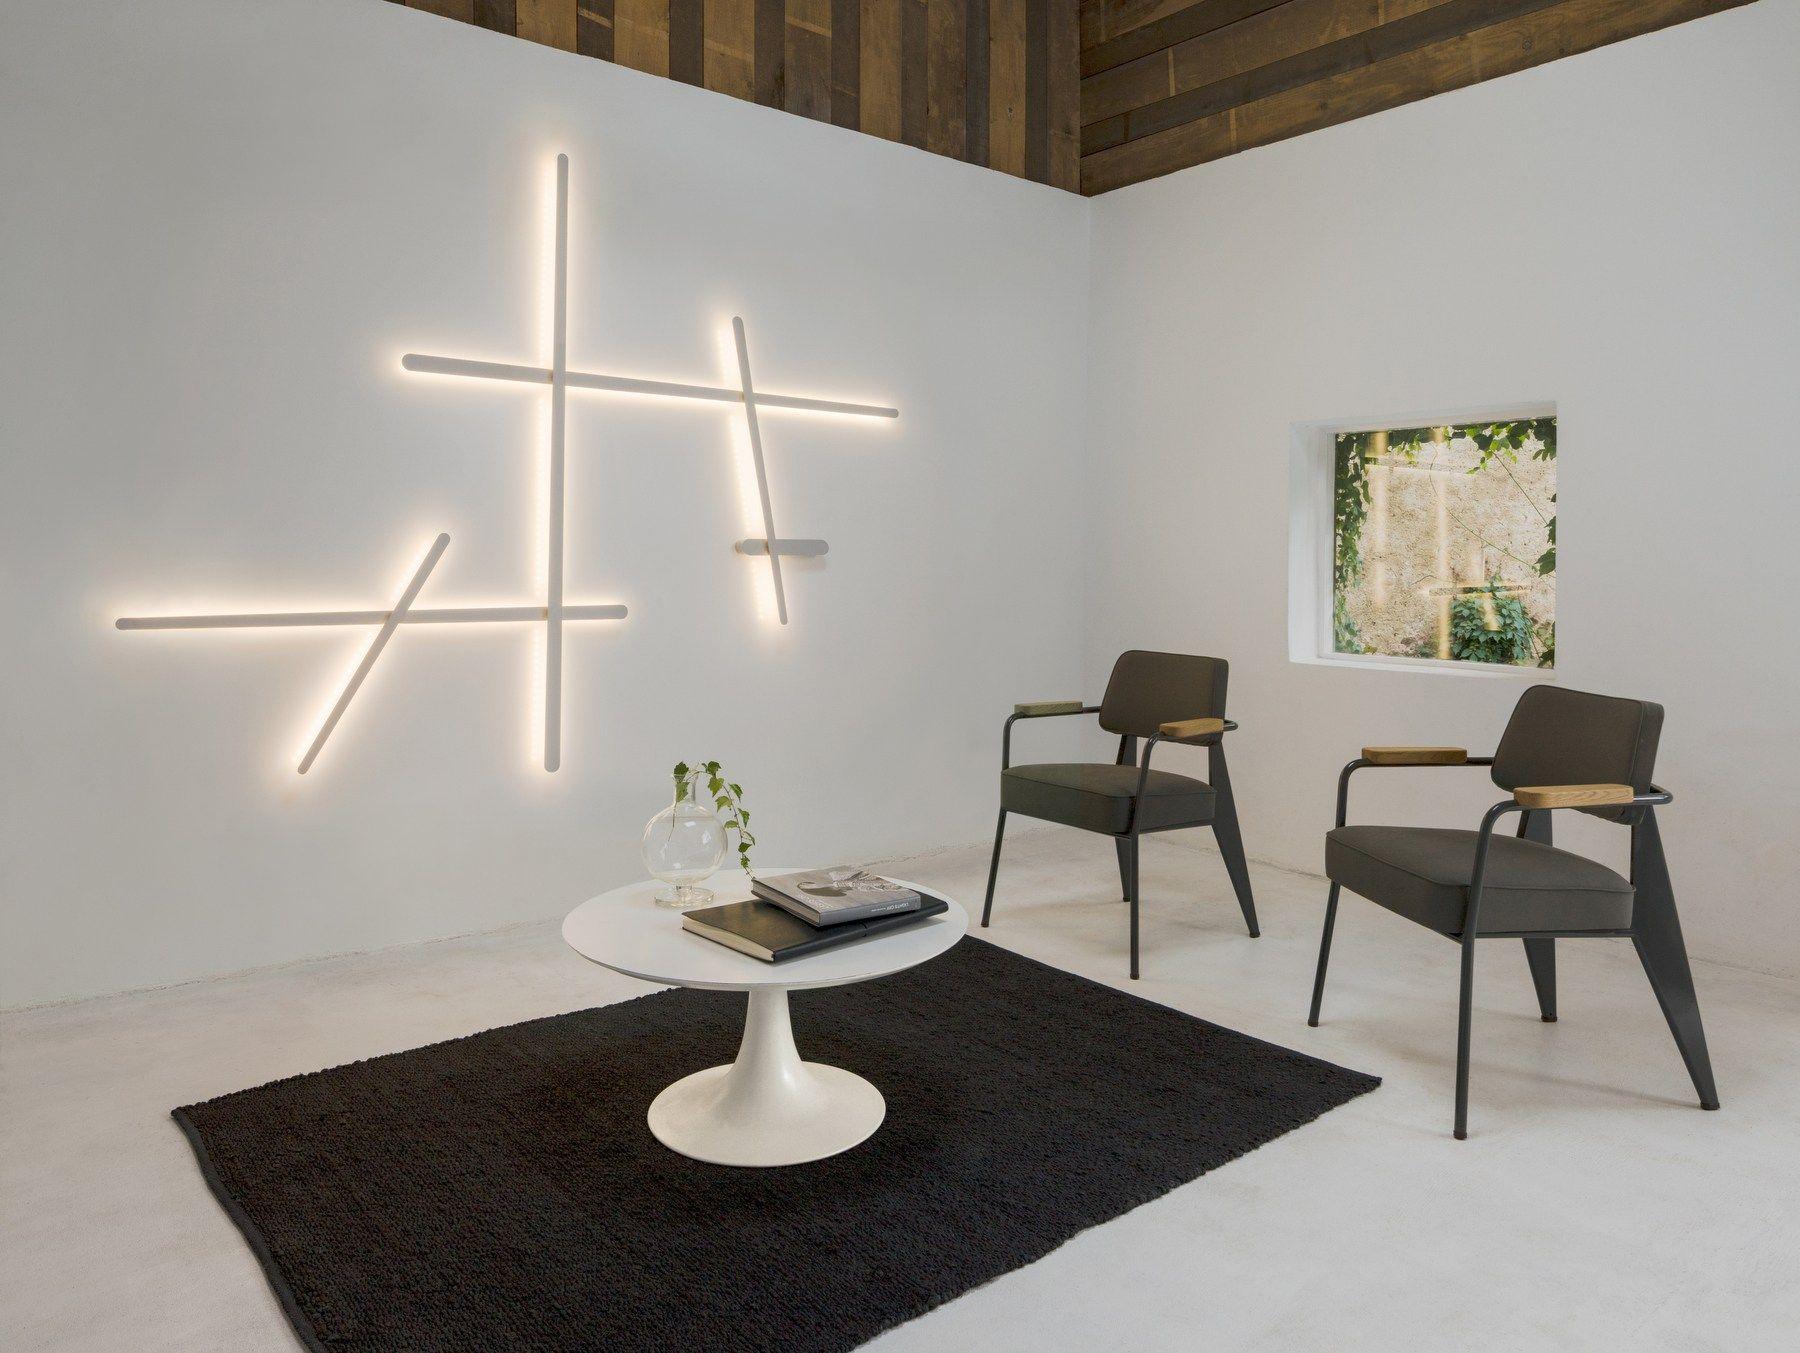 lampade a muro moderne : Lampade Applique Da Parete : Lampade Da Muro (100 images)